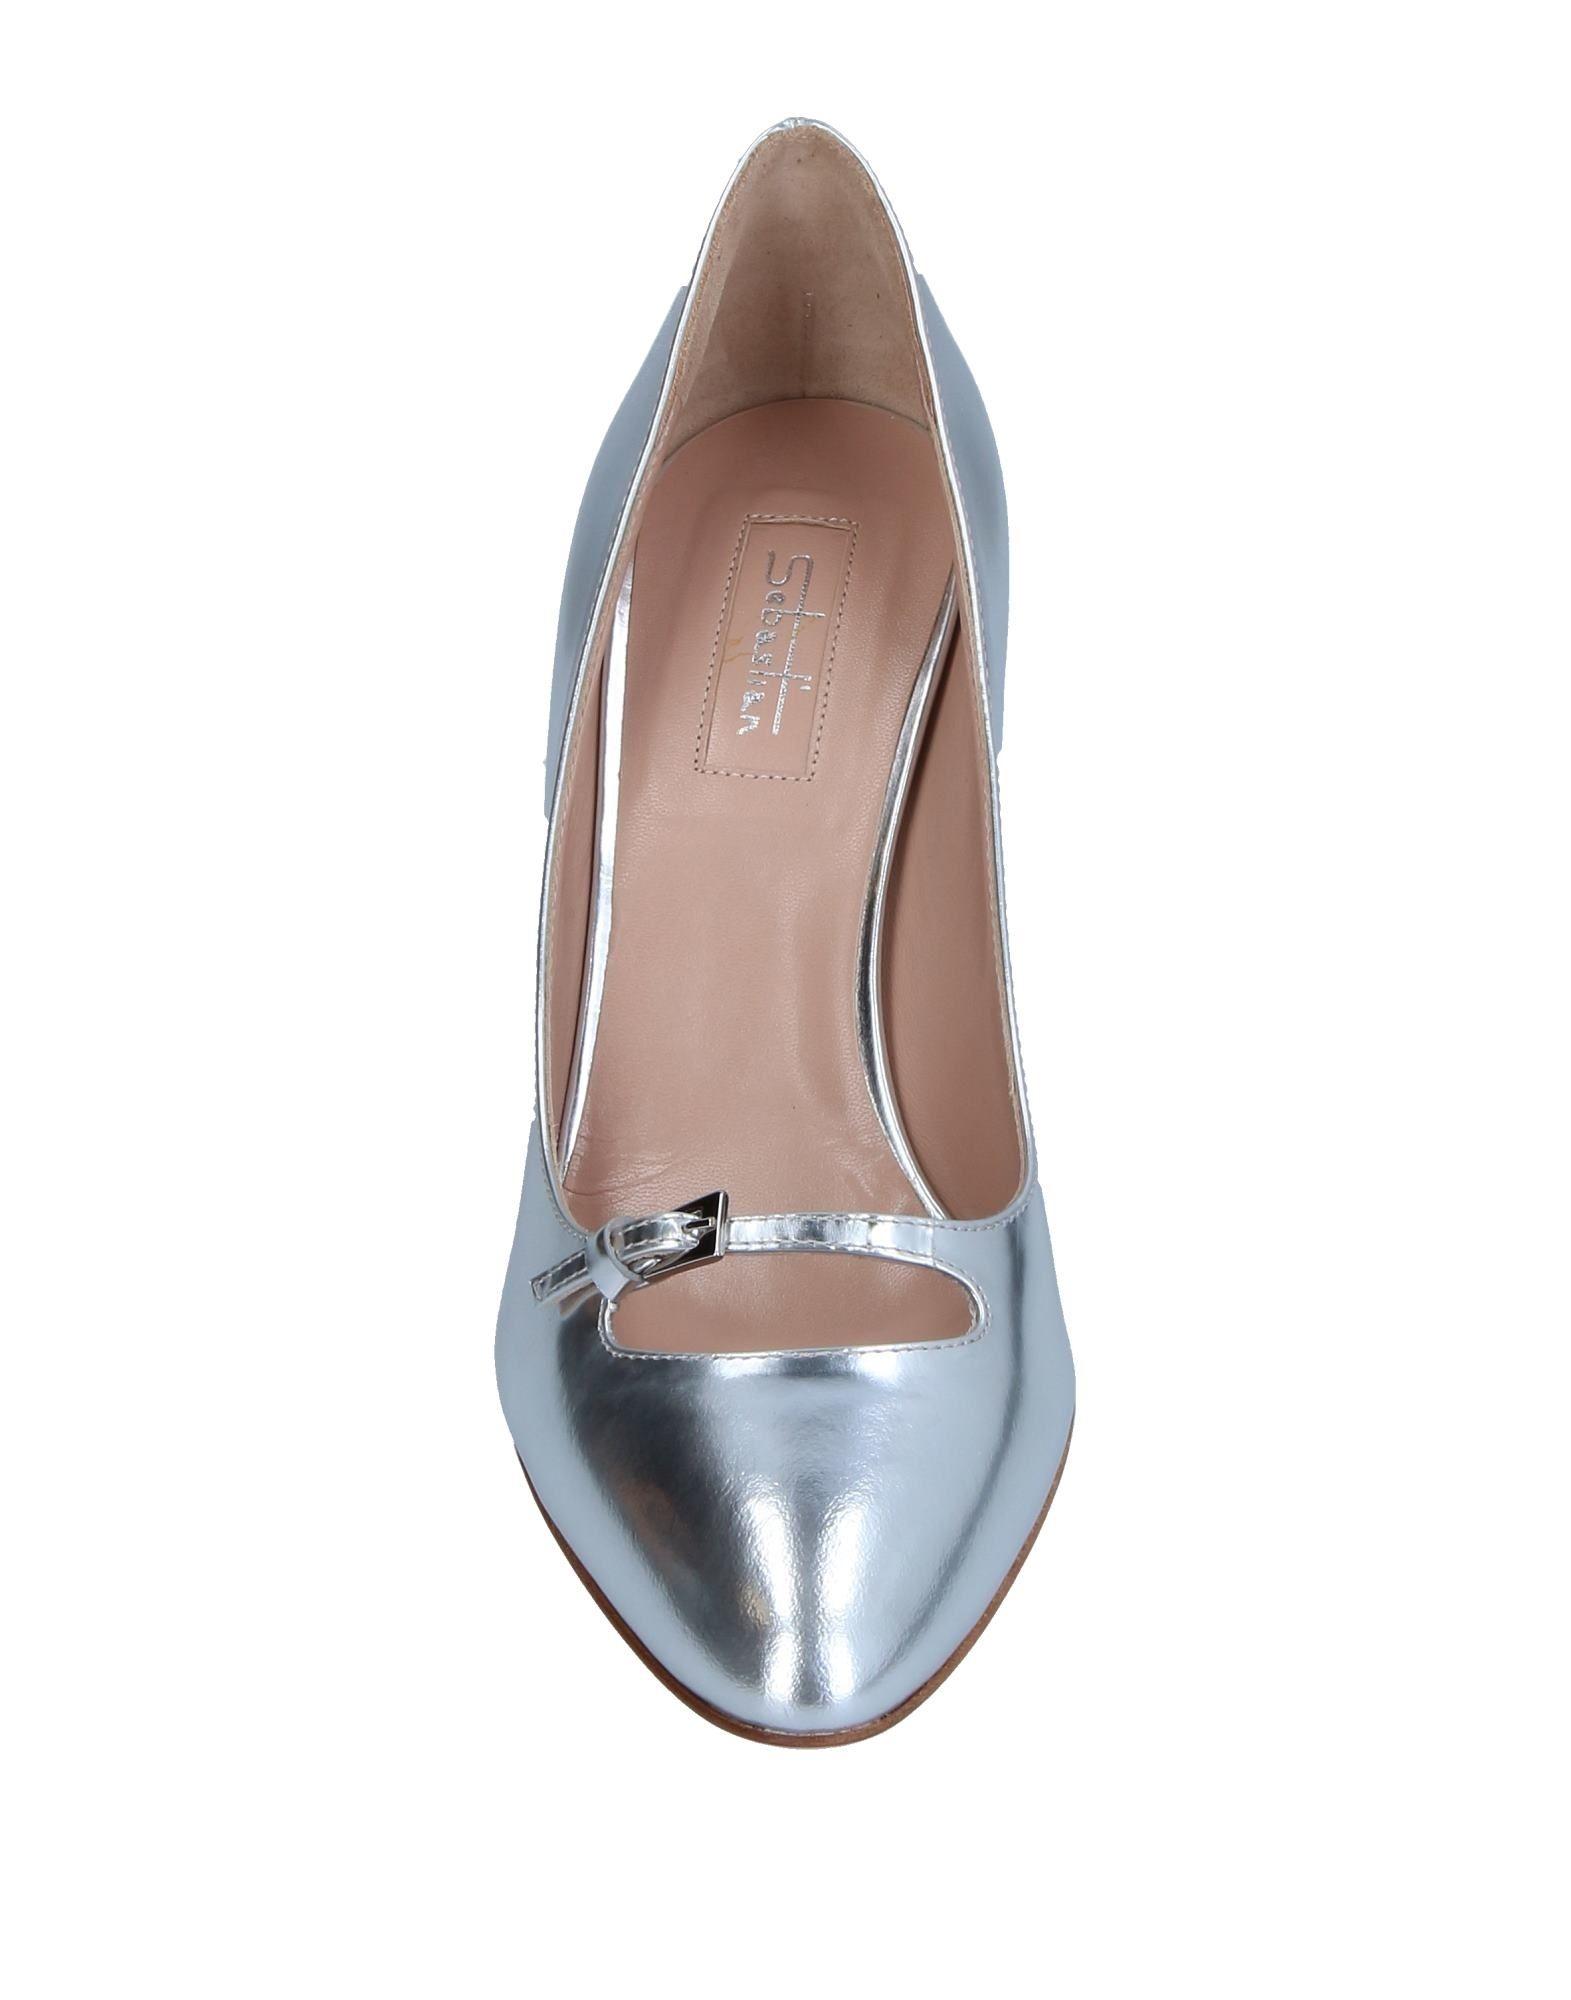 Sebastian Pumps Damen Damen Pumps  11331870KQ Heiße Schuhe dbfd1e